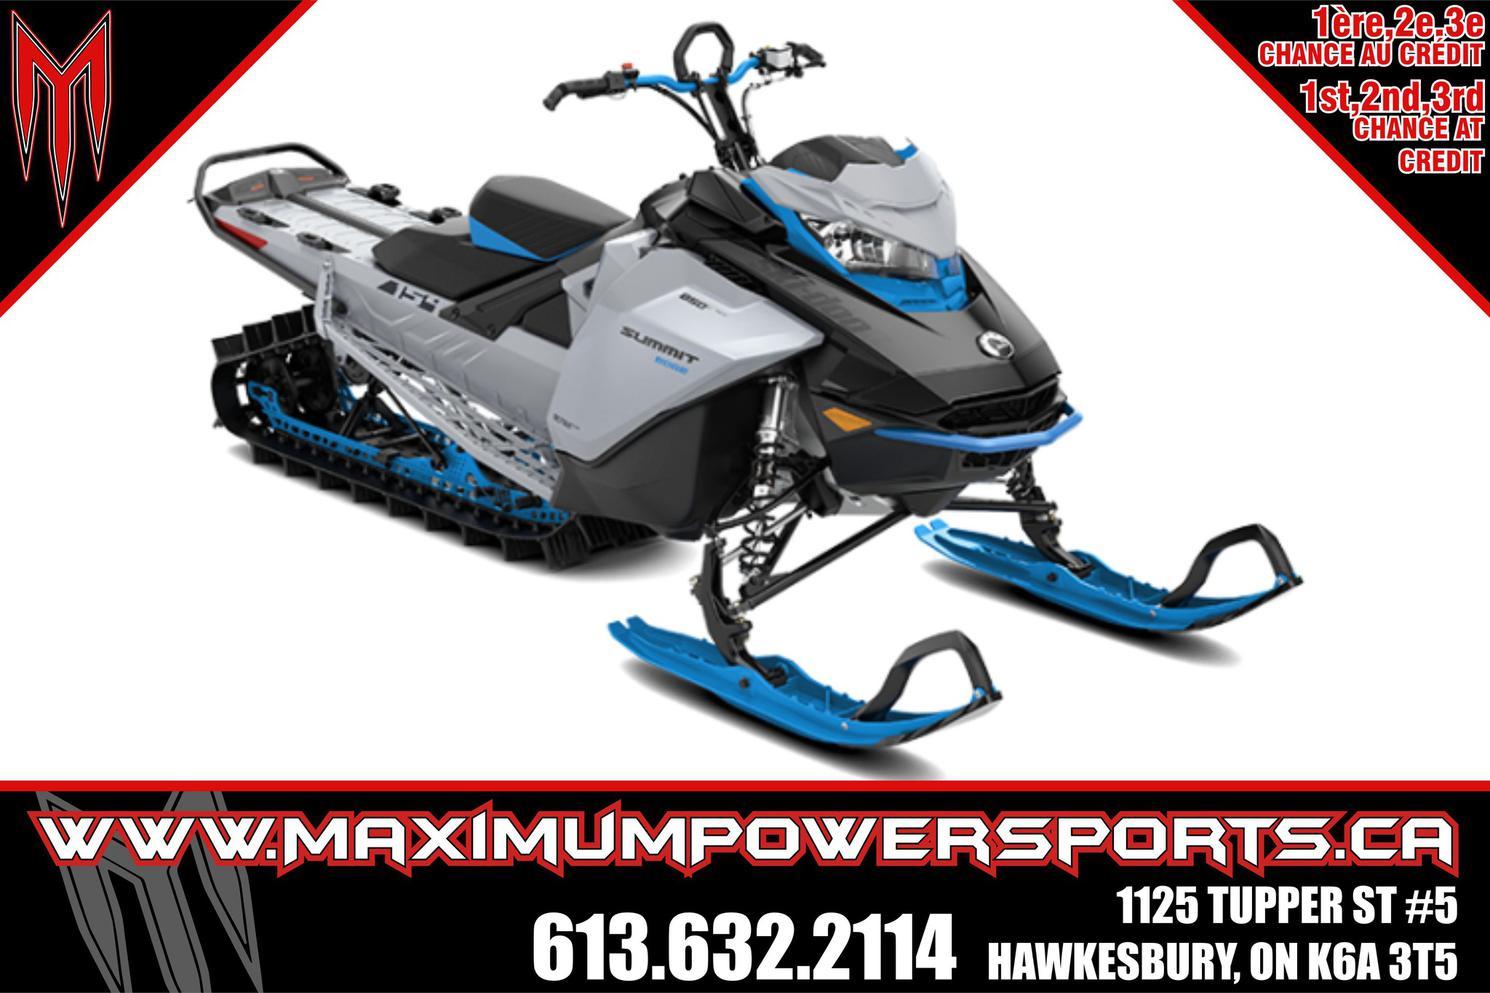 2022 Ski-Doo SUMMIT EDGE 154 850 E-TEC POWDERMAX LIGHT FLEXEDG - SUMMIT EDGE 154 850 E-TEC POWDERMAX LIGHT FLEXEDGE 2.5 SHOT